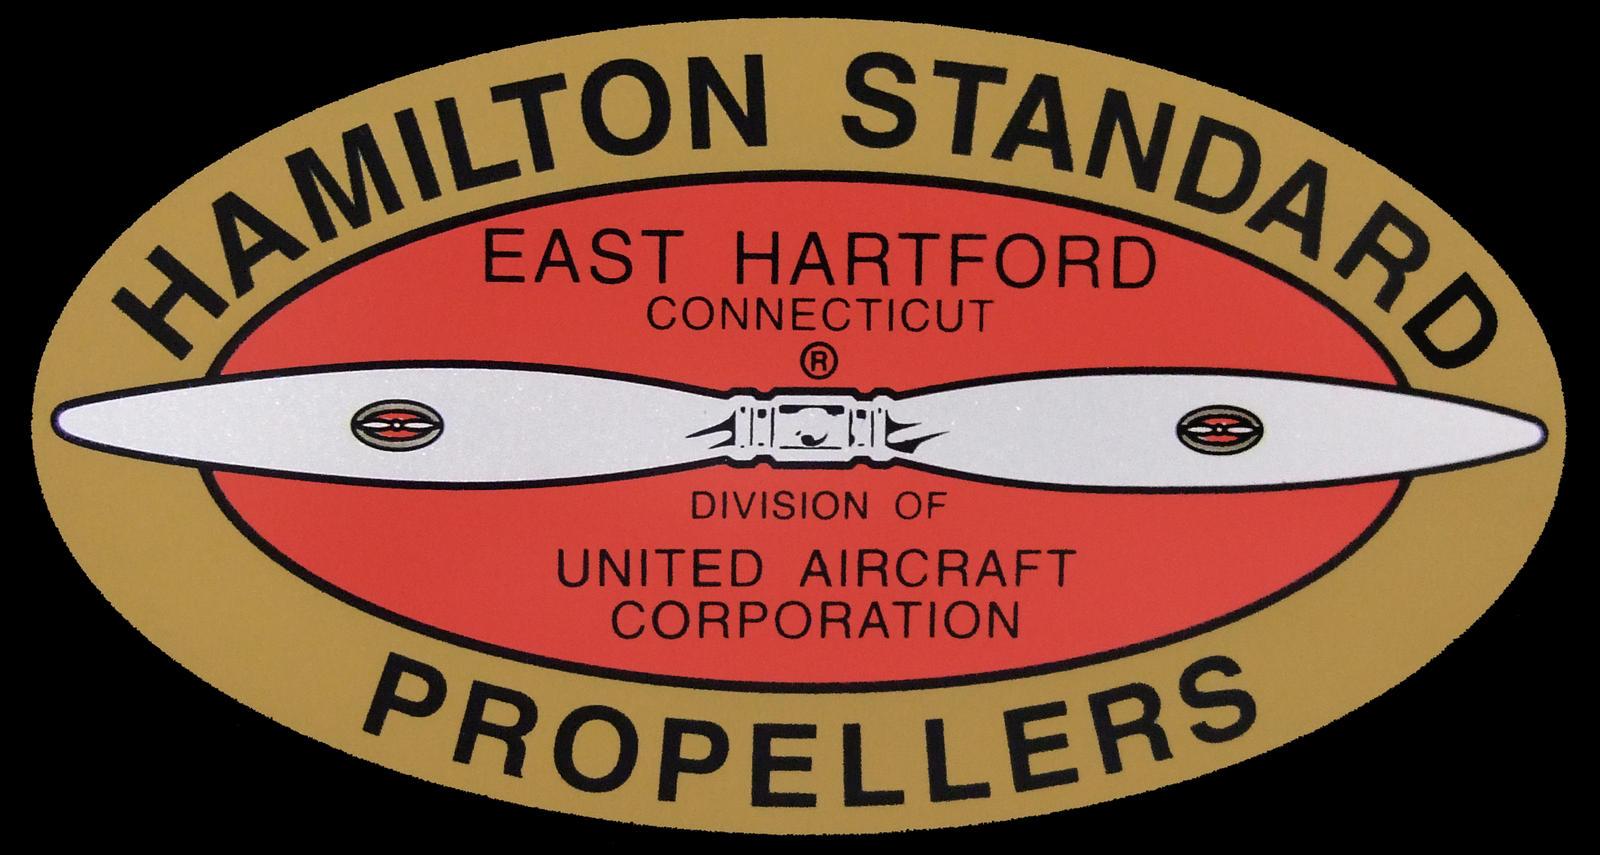 Hamilton+Standard.jpg